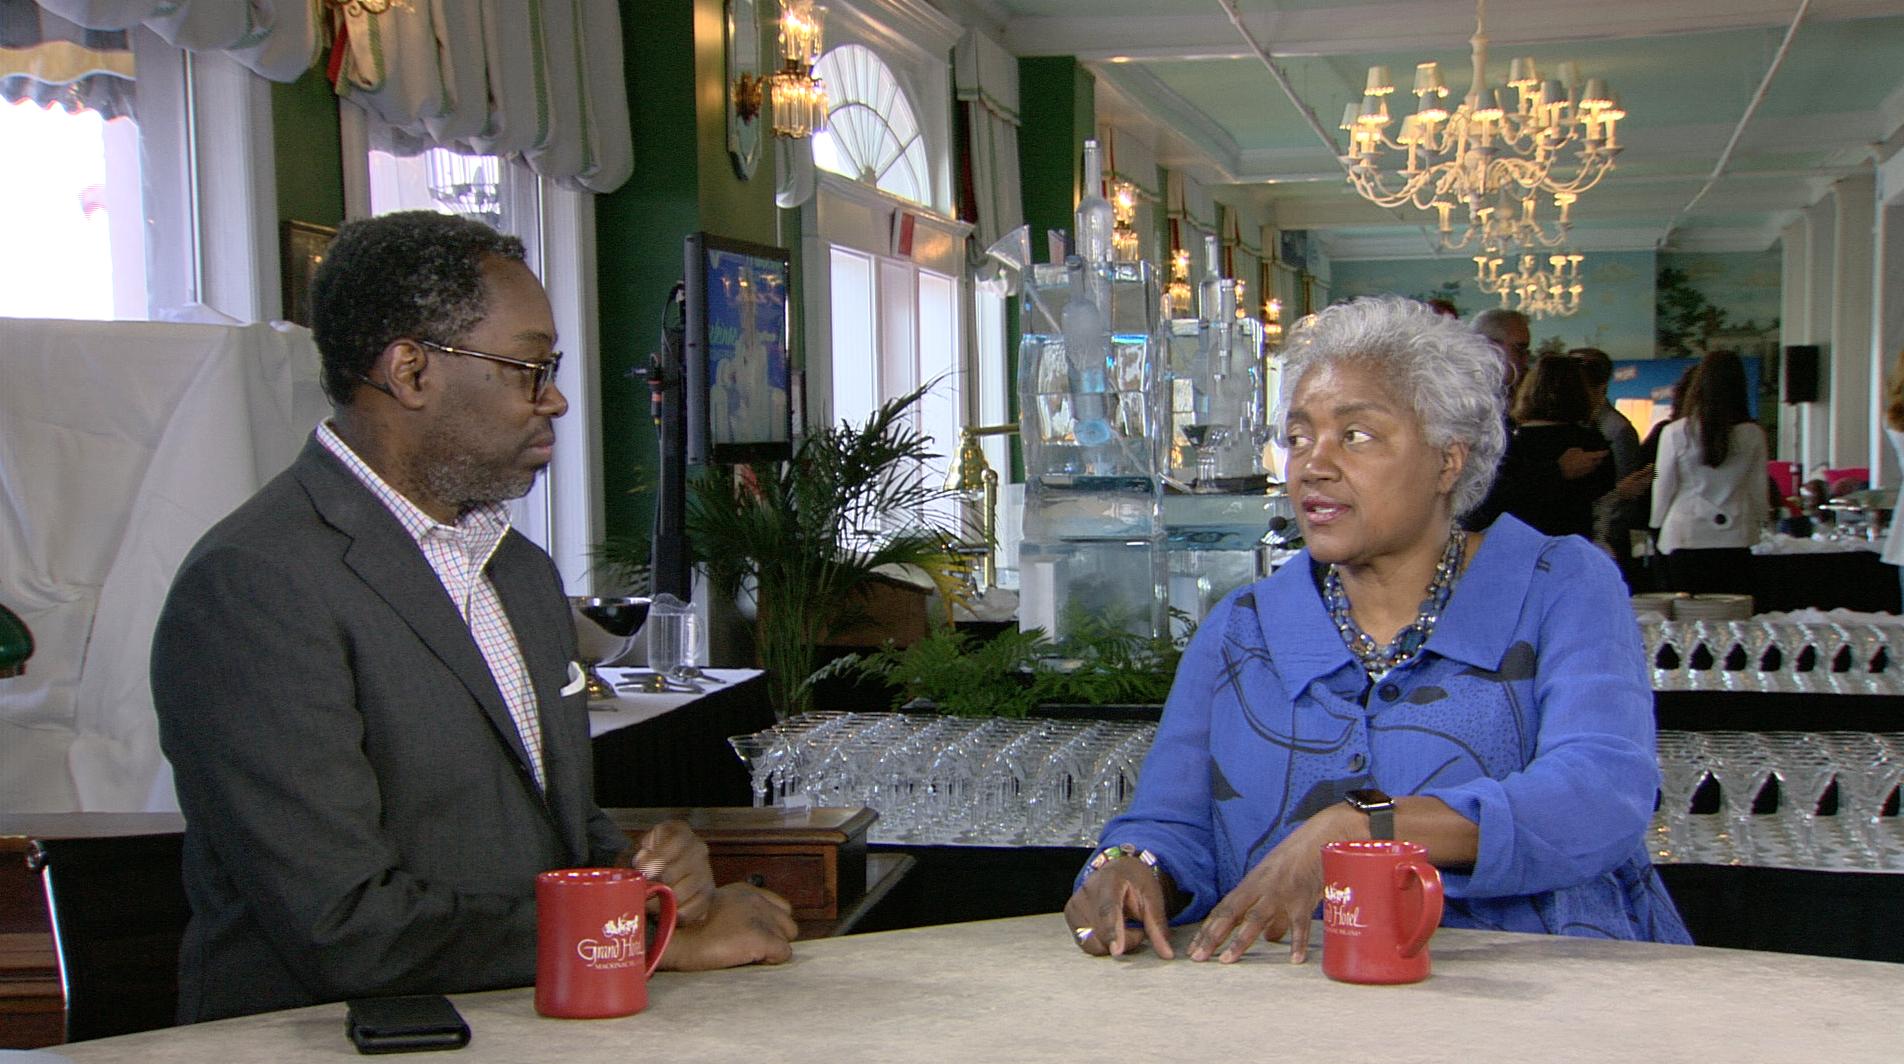 6/9/19: American Black Journal – Donna Brazile, Democratic Political Strategist